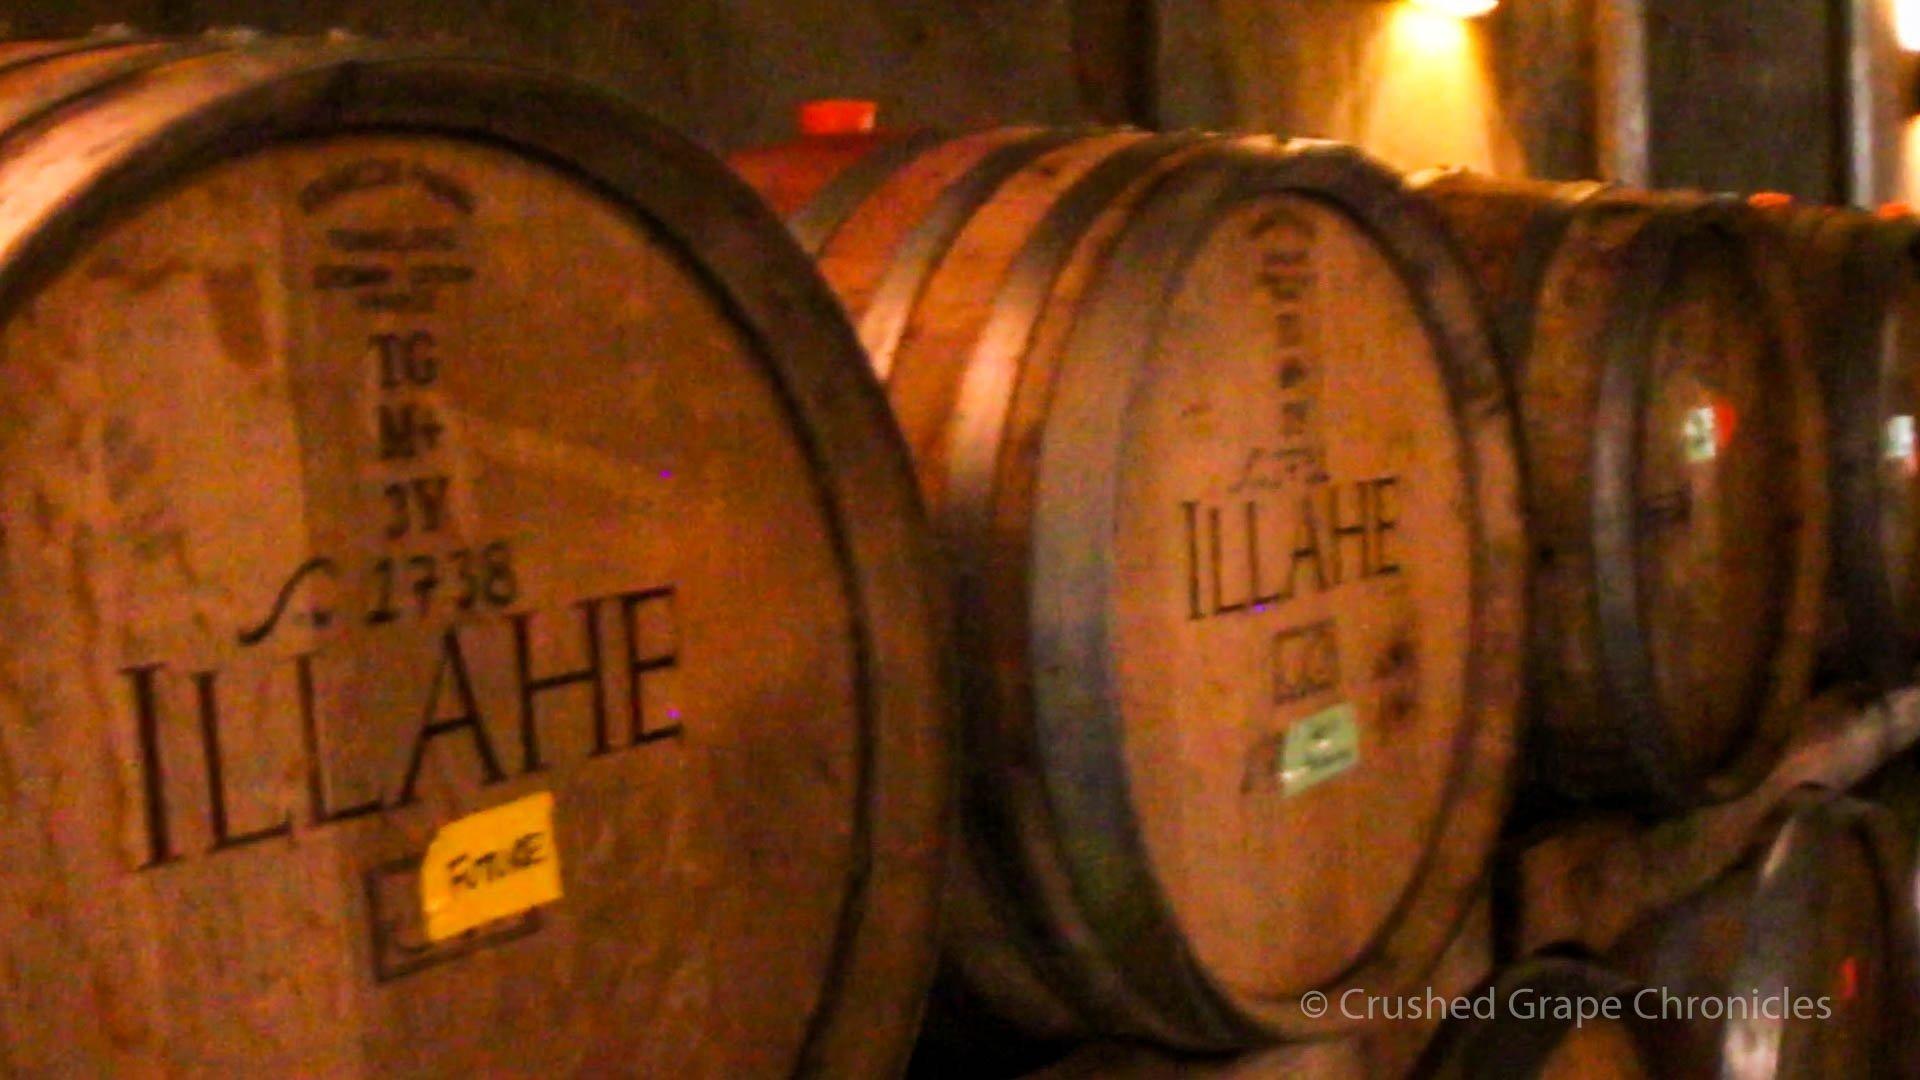 Illahe Vineyards Cellar